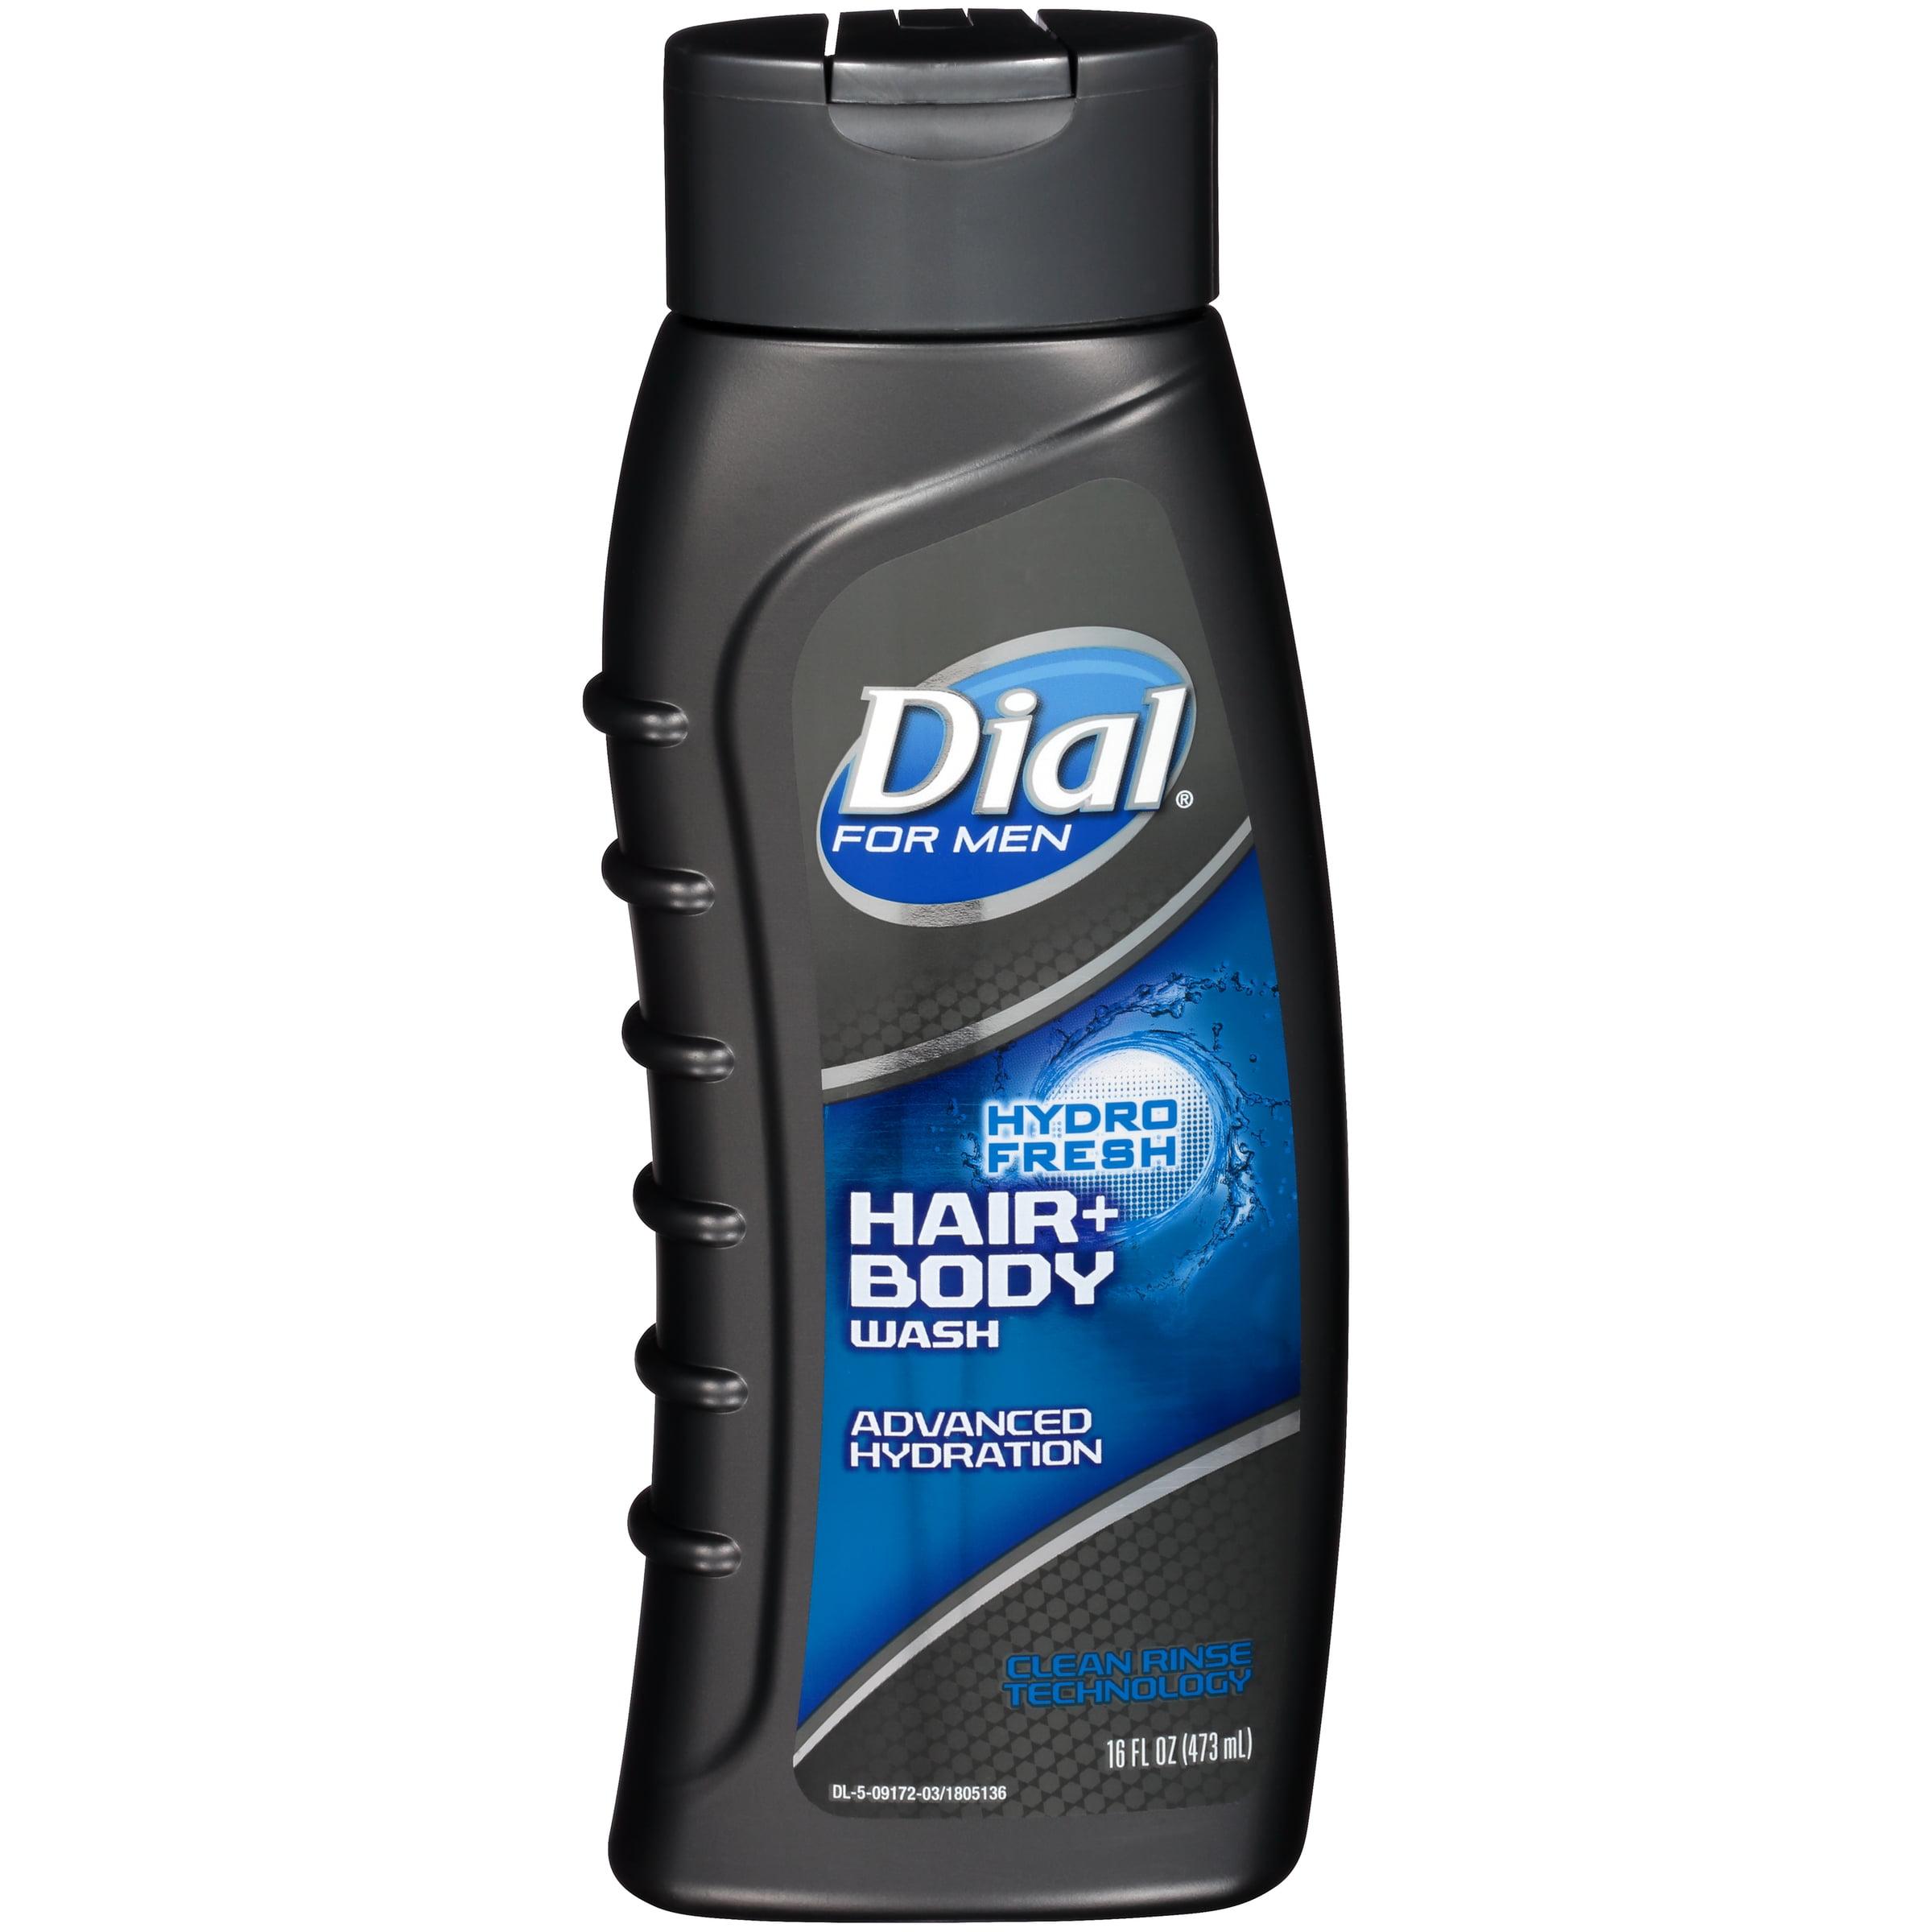 Dial for Men Hair & Body Wash, HydroFresh, 16 Ounce